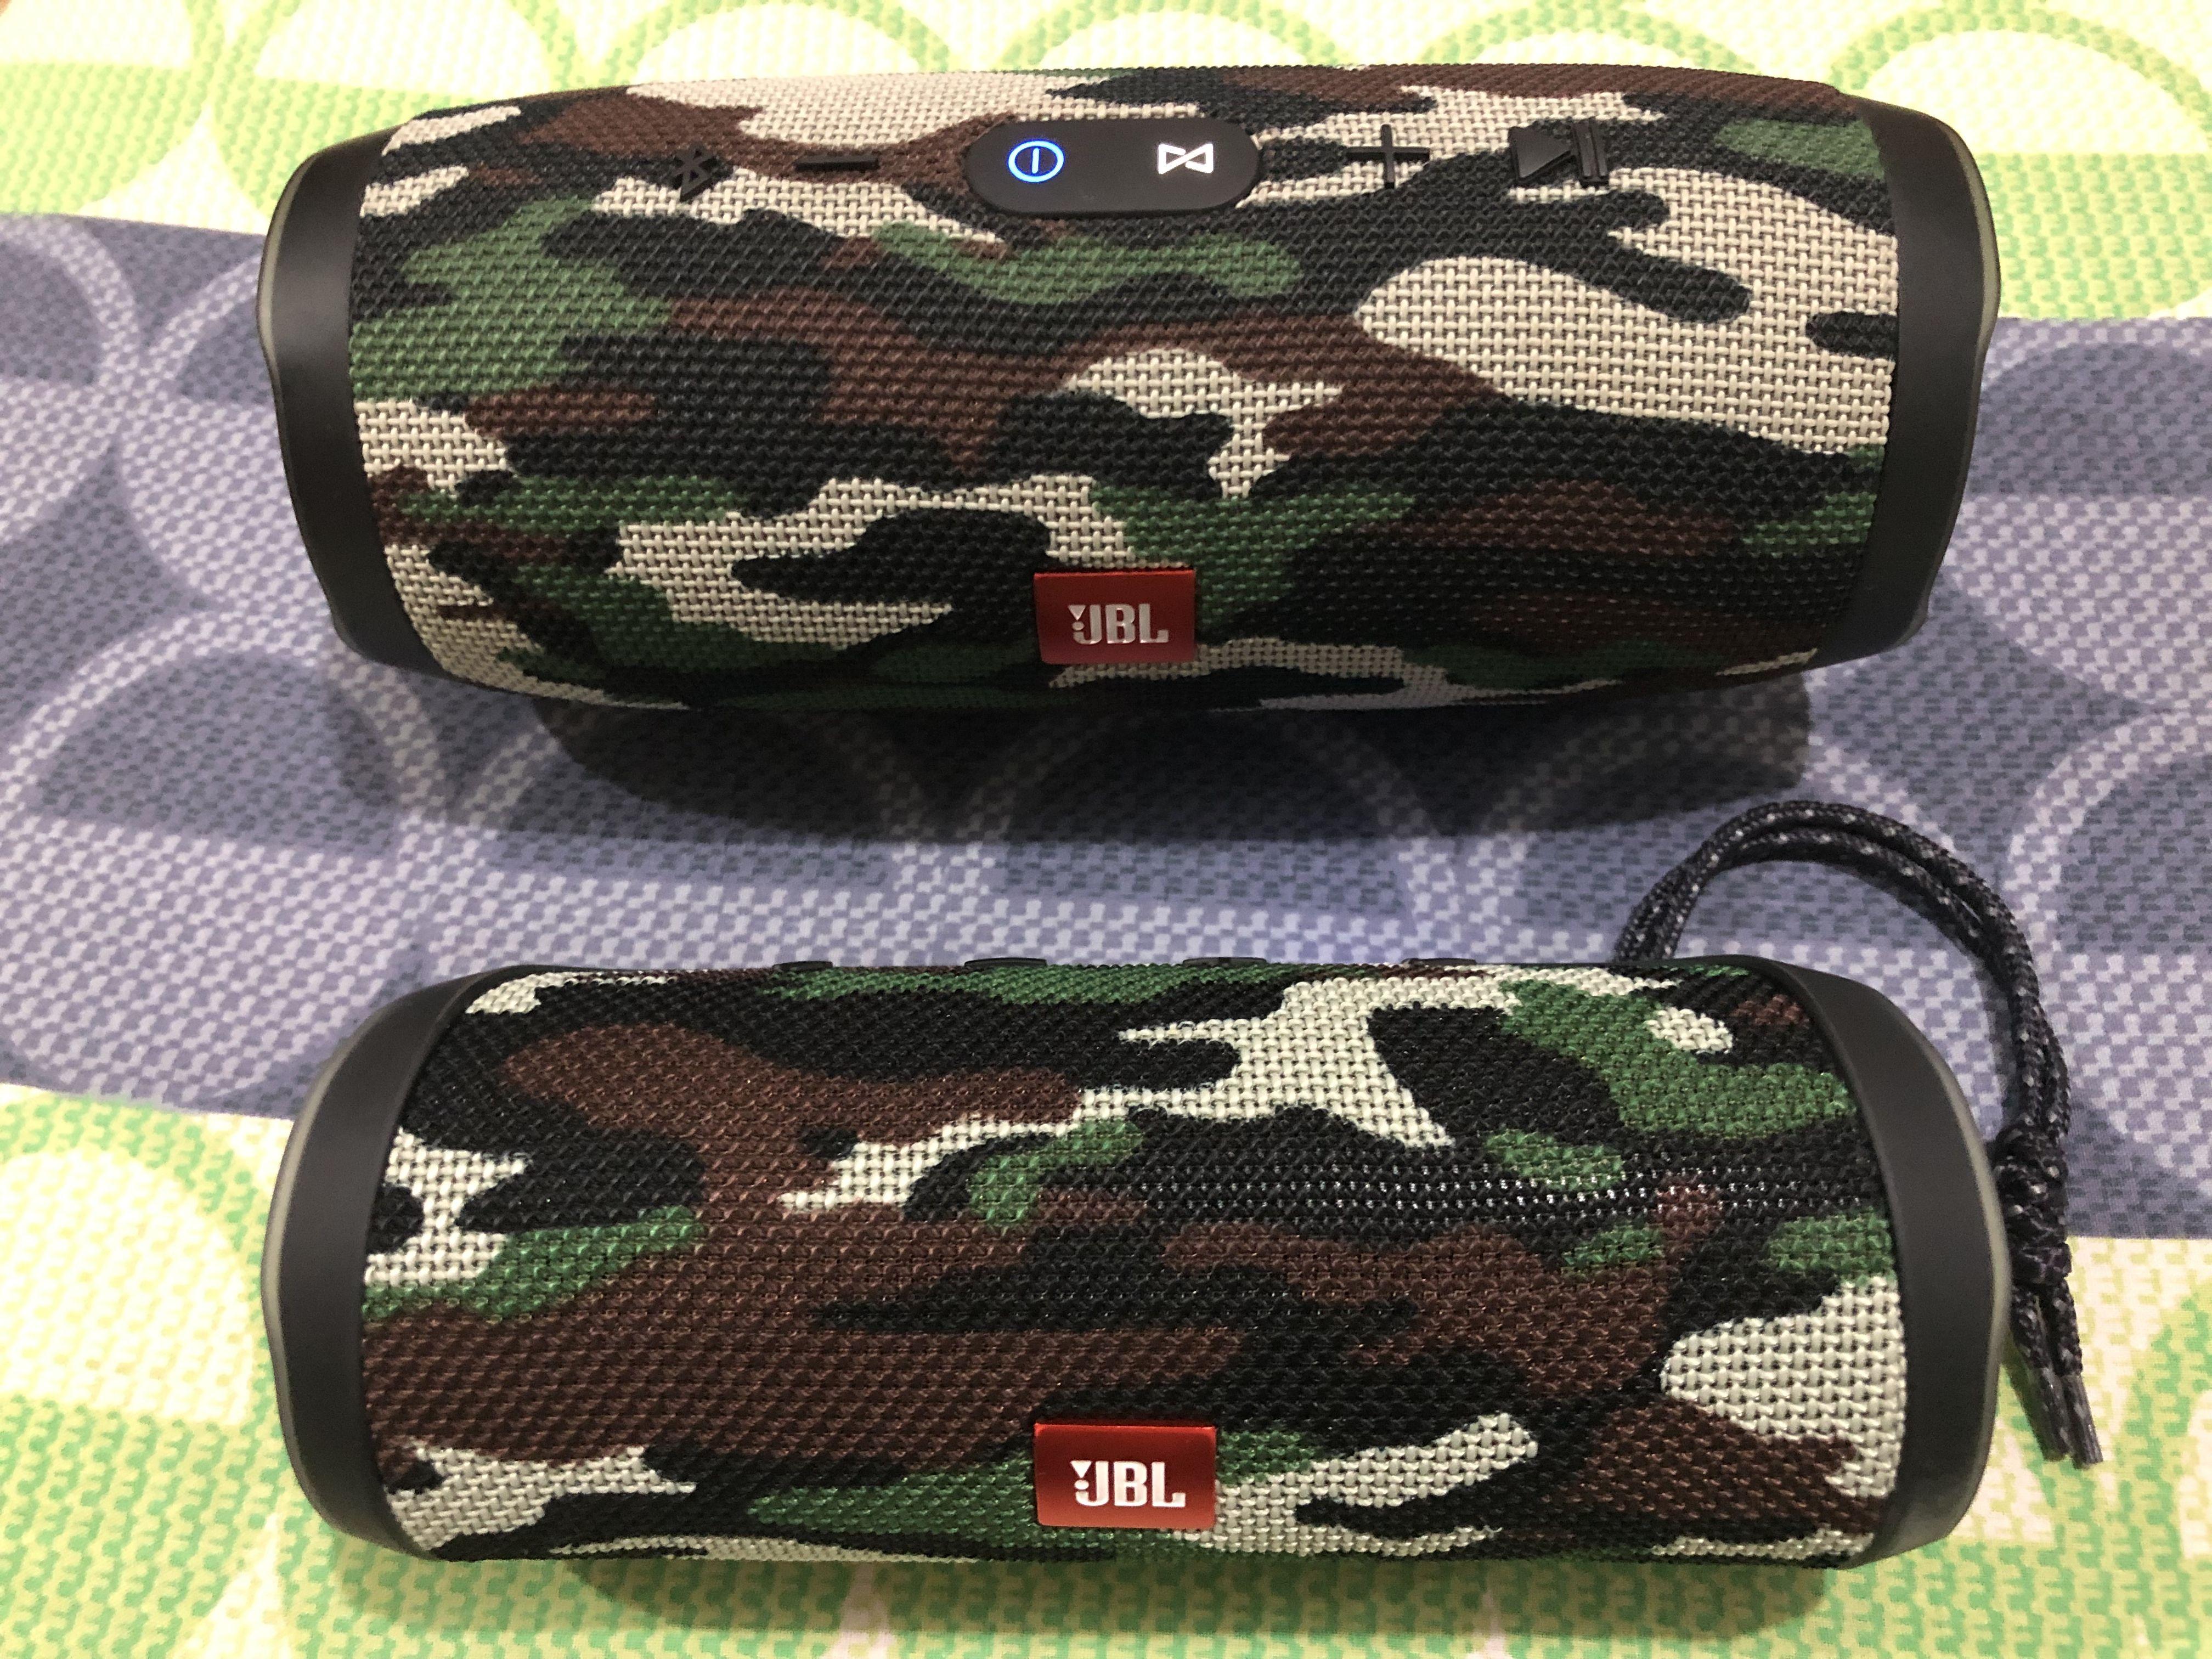 Jbl Charge 3 And Jbl Flip 4 Color Scout Bluetooth Speakers Portable Jbl Flip 4 Jbl